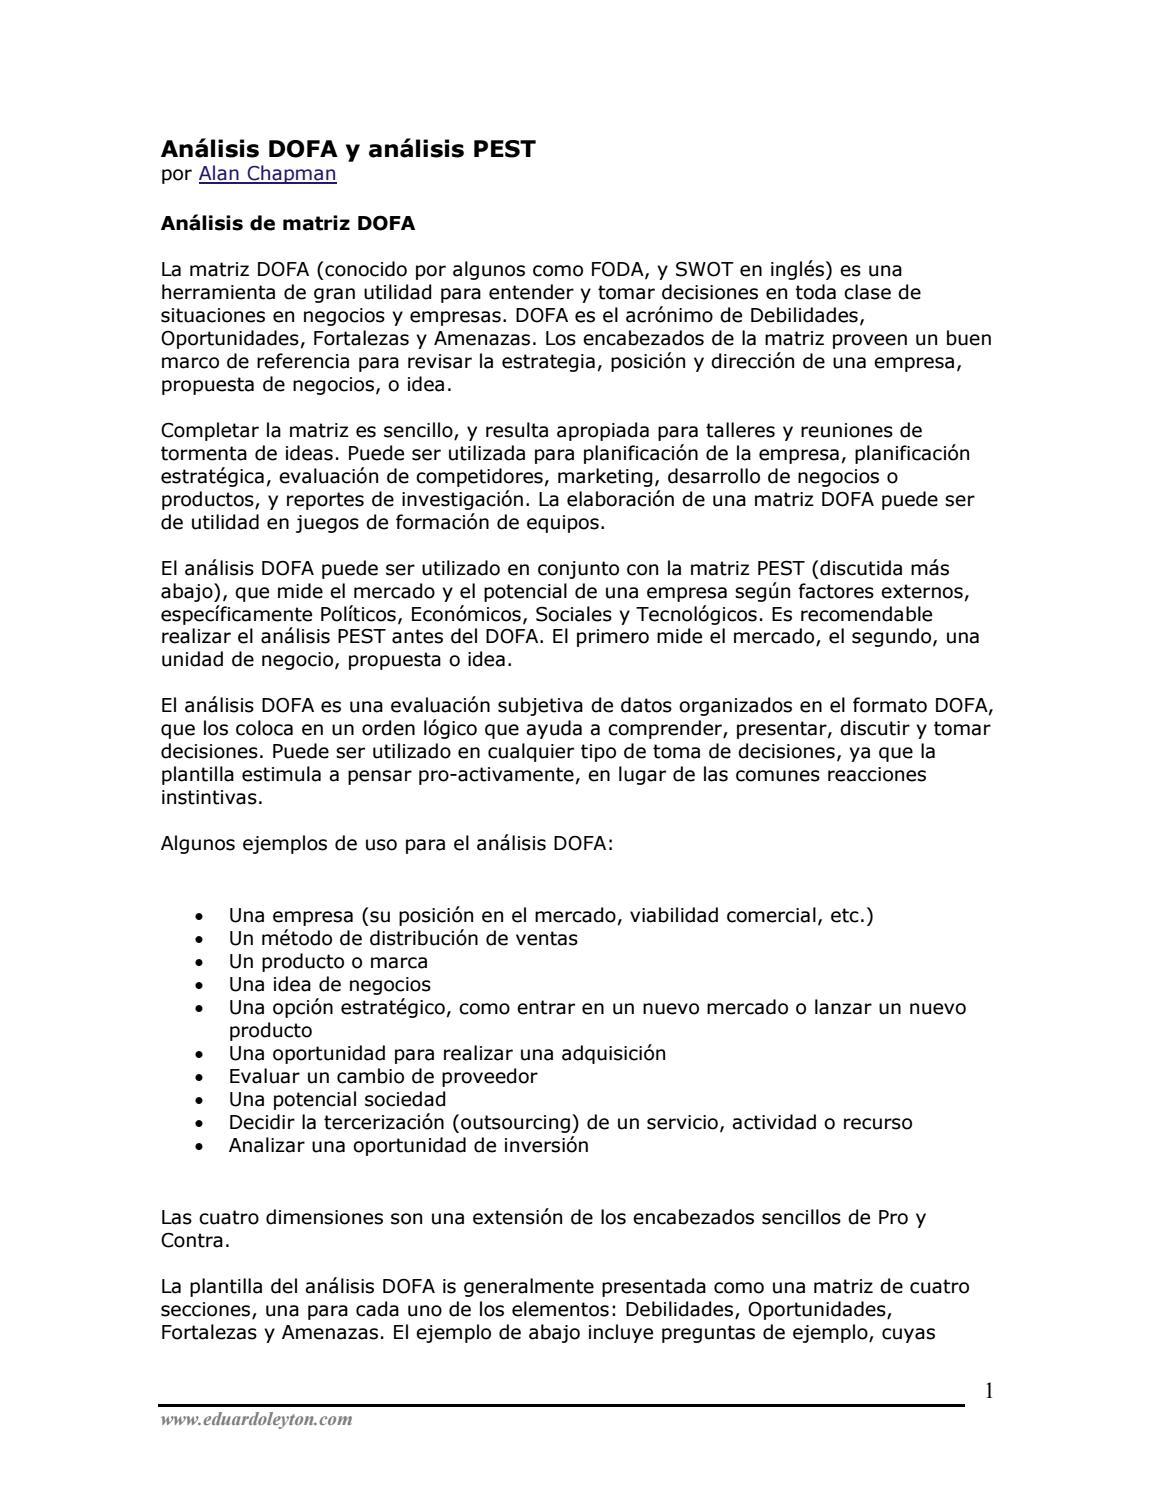 01 analisis dofa y analisis pest by jorge gomez - issuu